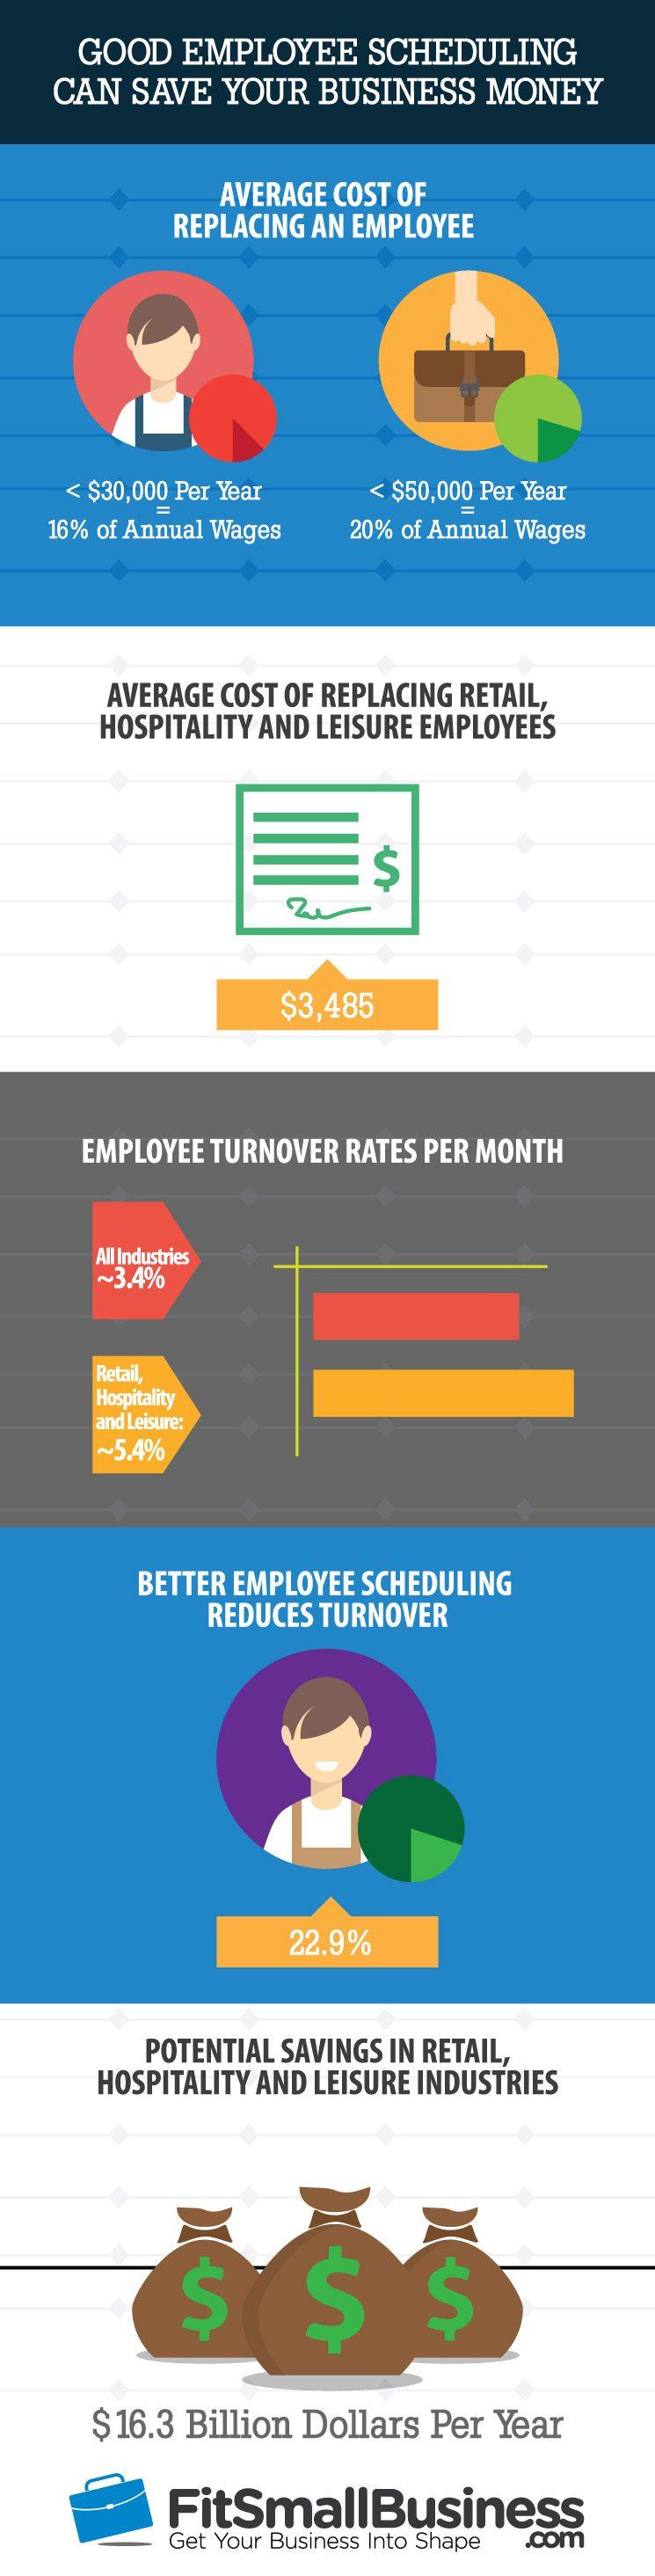 Good-Employee-Scheduling-745x2929-2